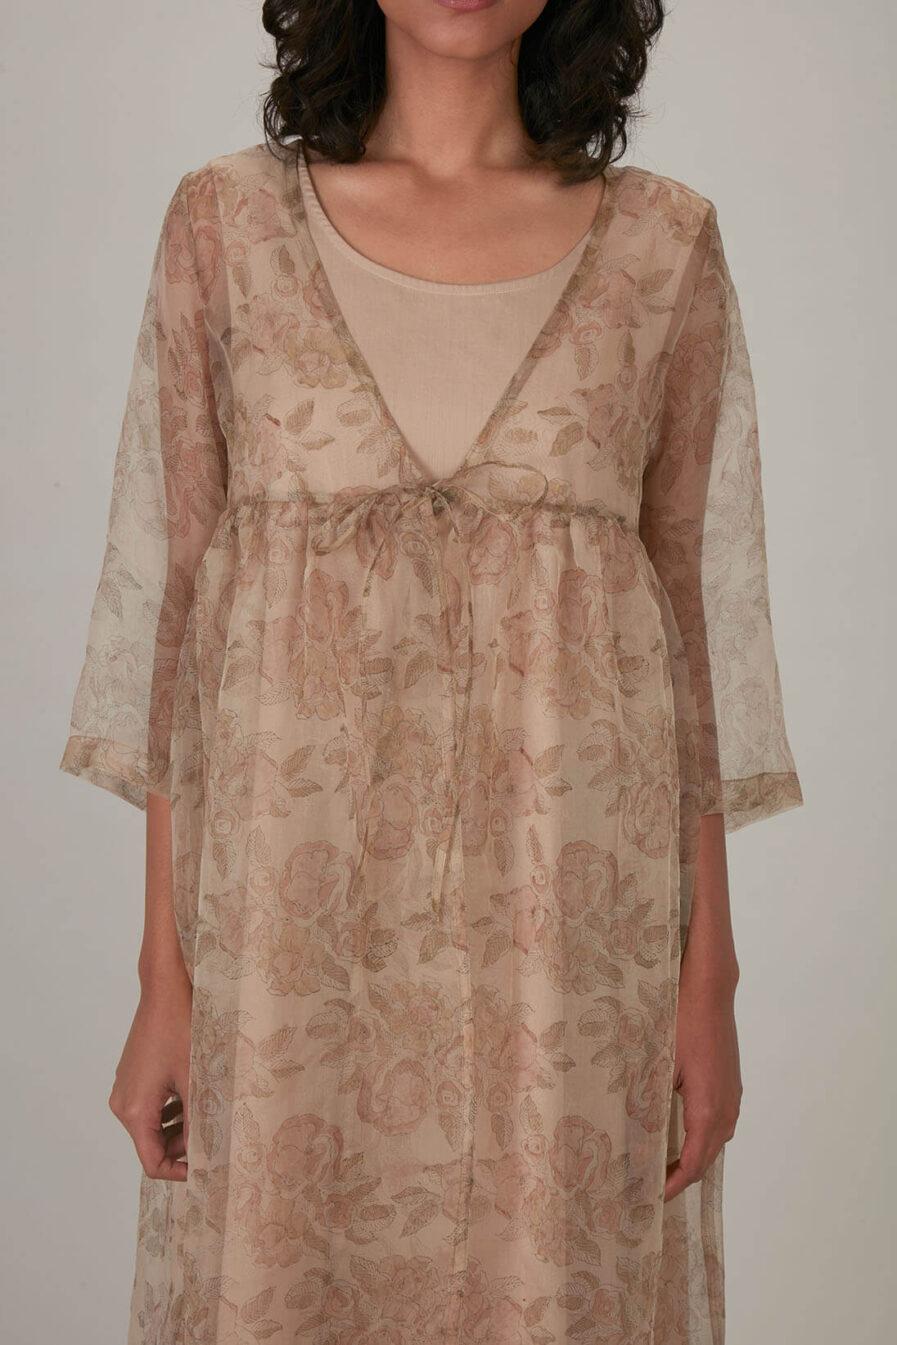 Anavila Peach Block Printed Organza Summer Dress